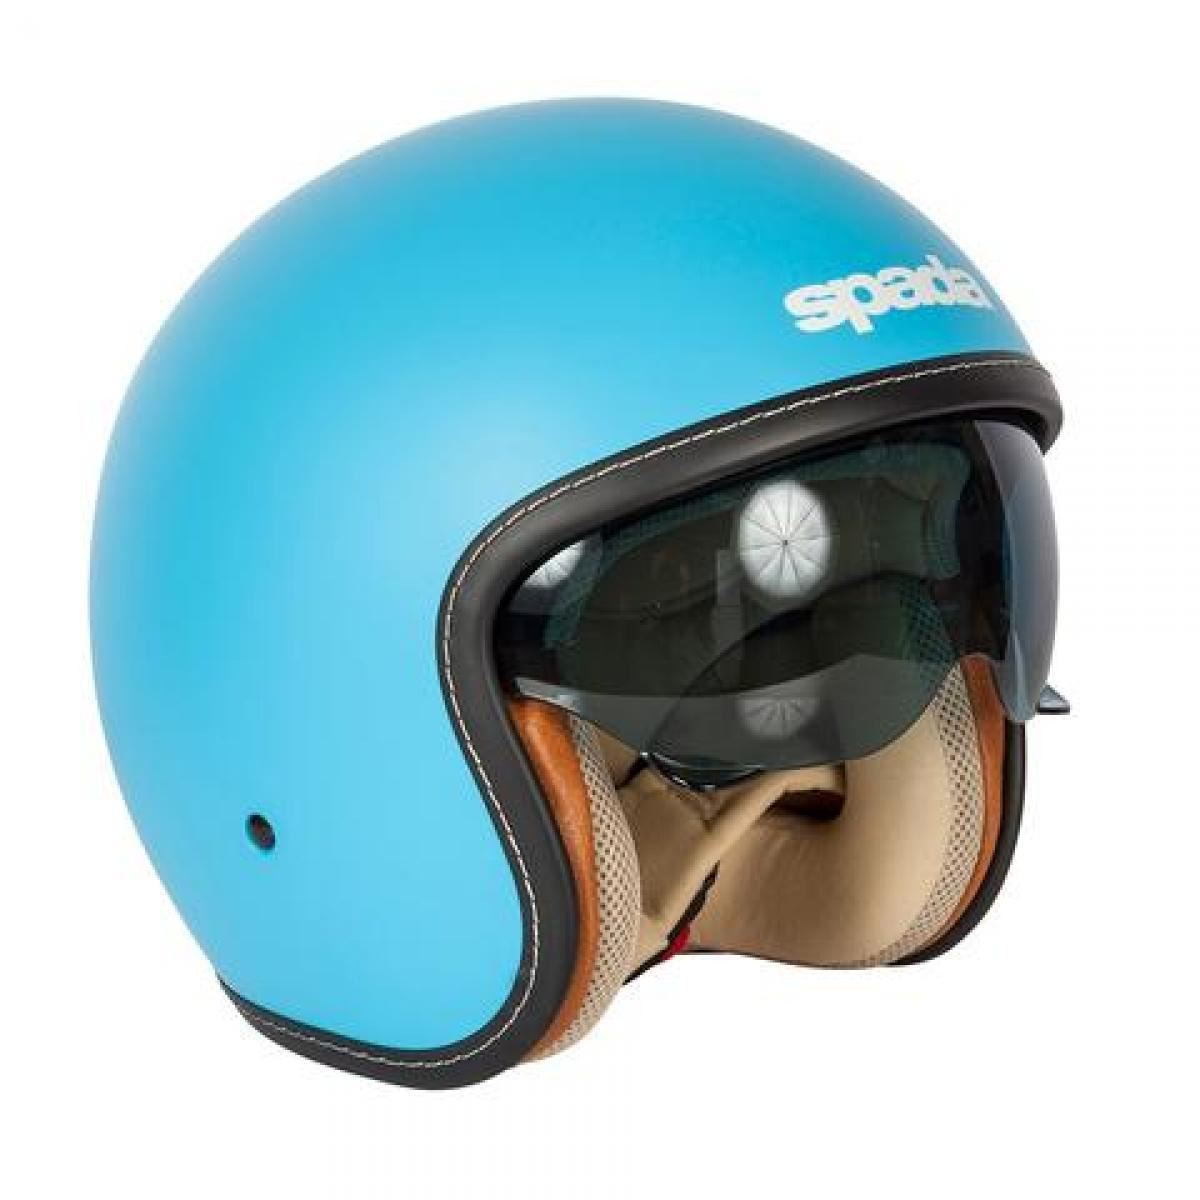 Spada-Raze-Ouvert-Casque-Bleu-Integre-Visiere miniature 20